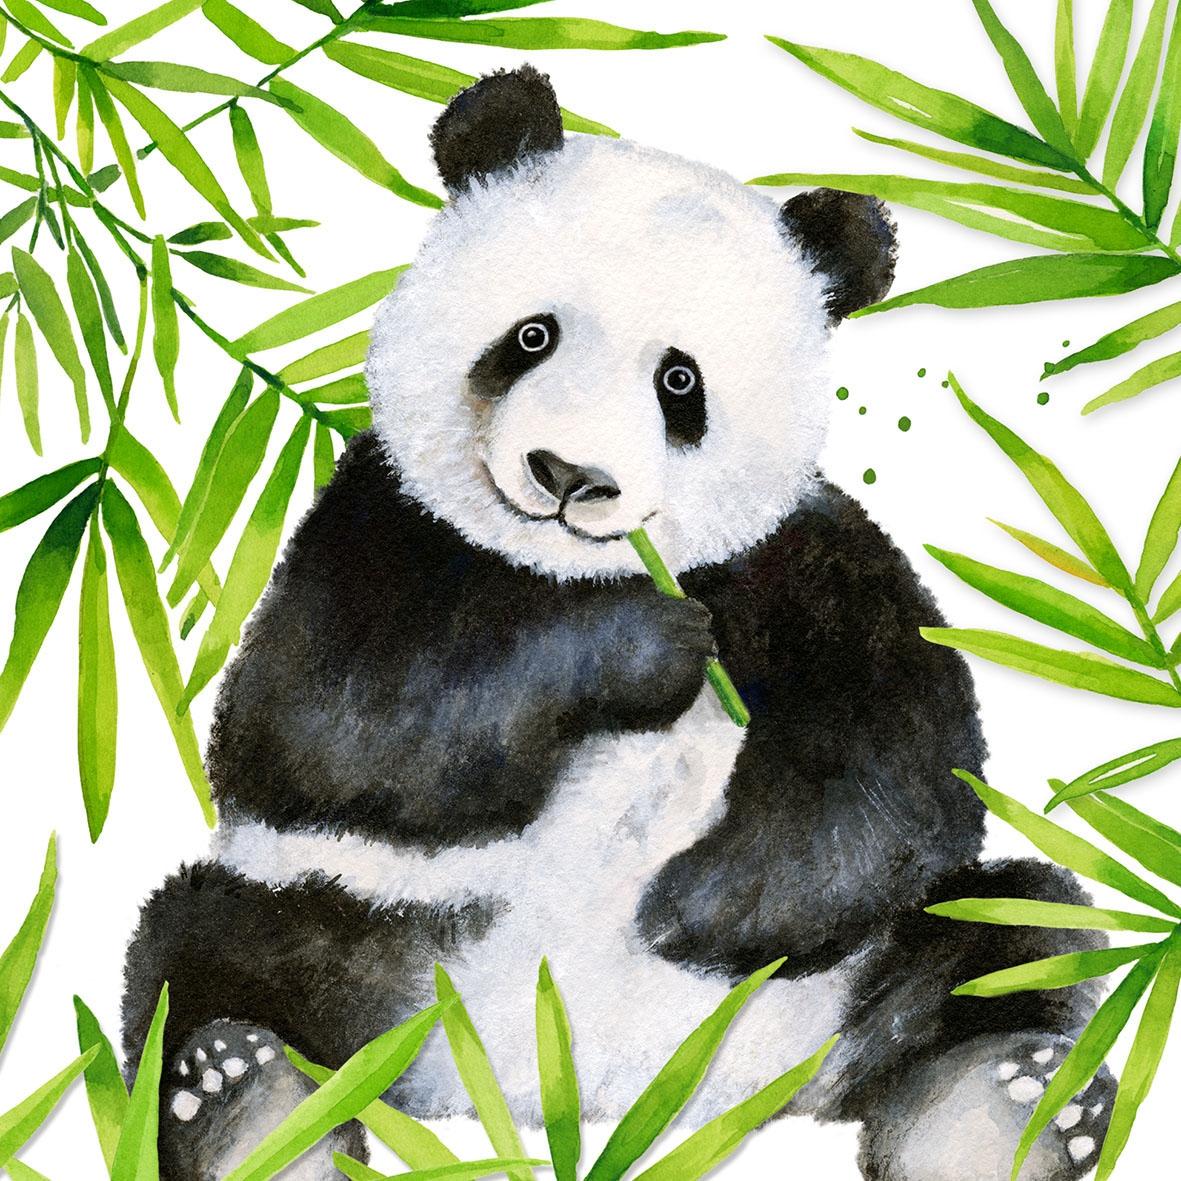 Servilletas 33x33 cm - Tropical Panda